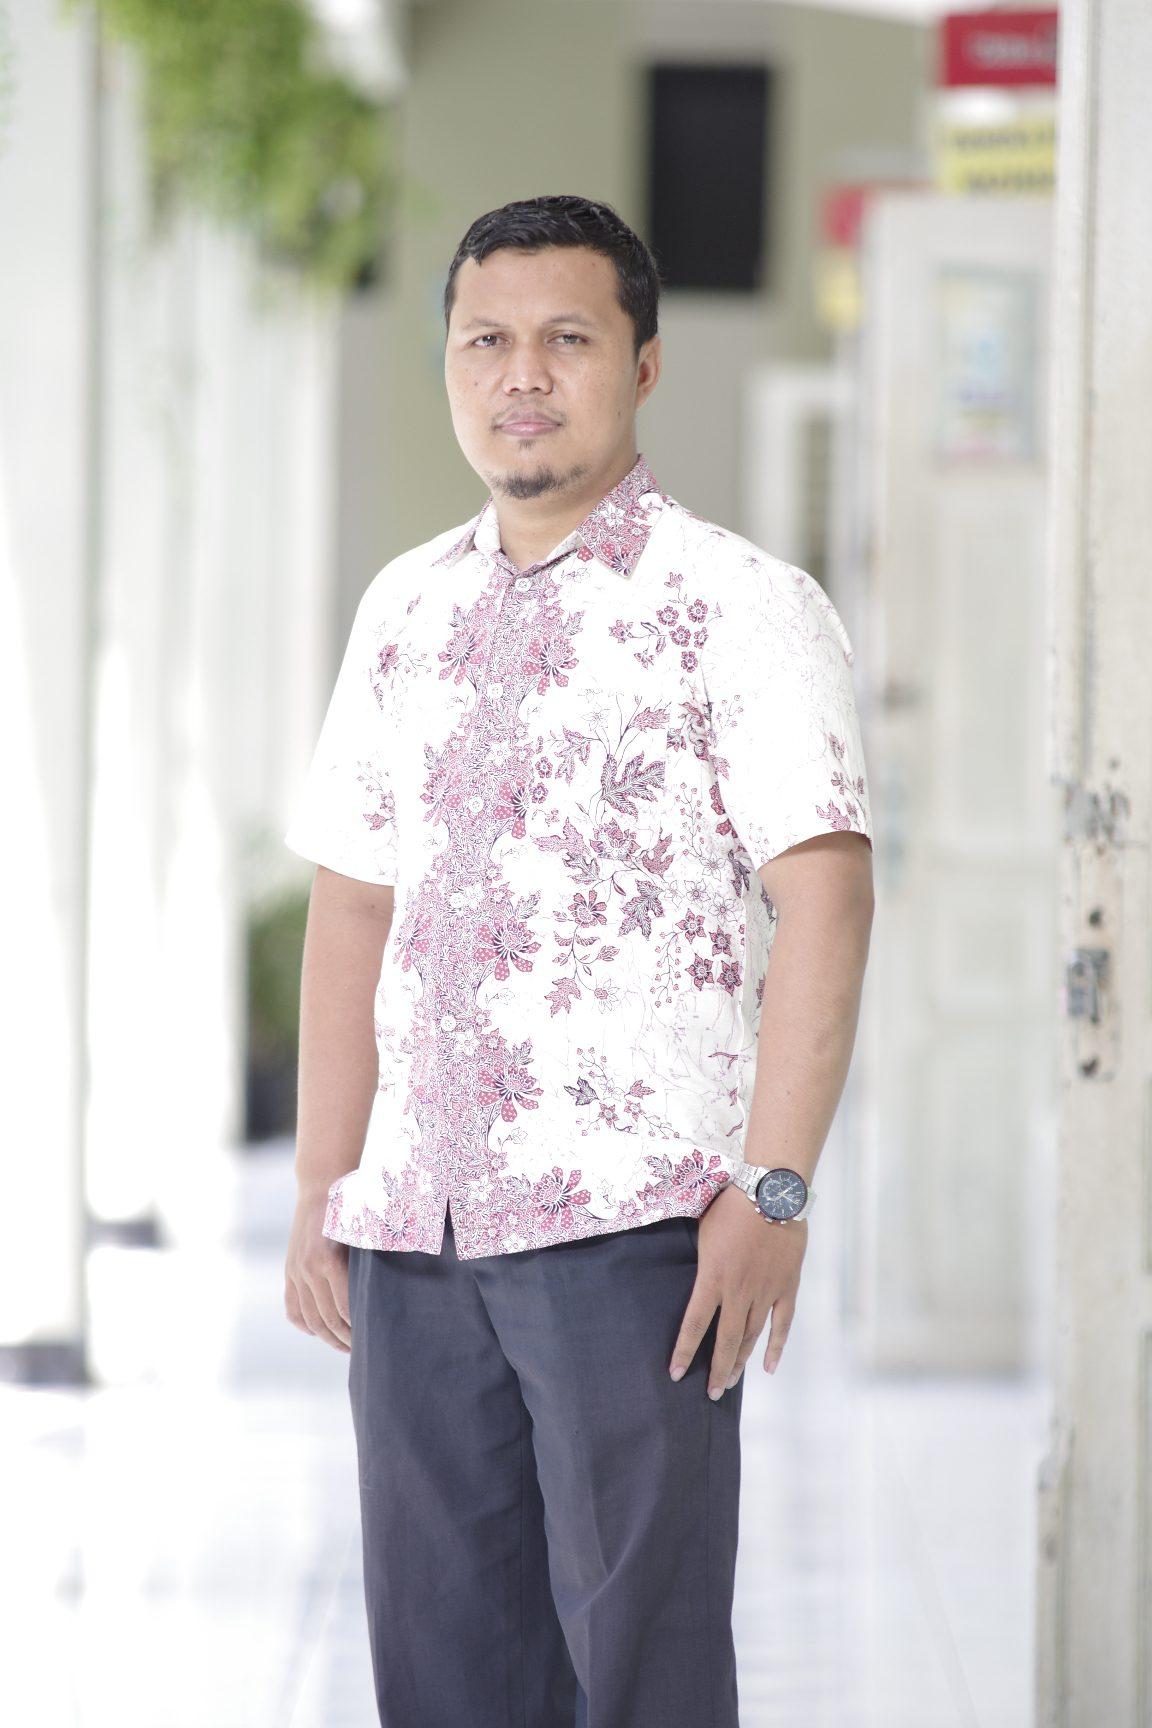 Mohammad Misbahus Surur, S.Pd.I